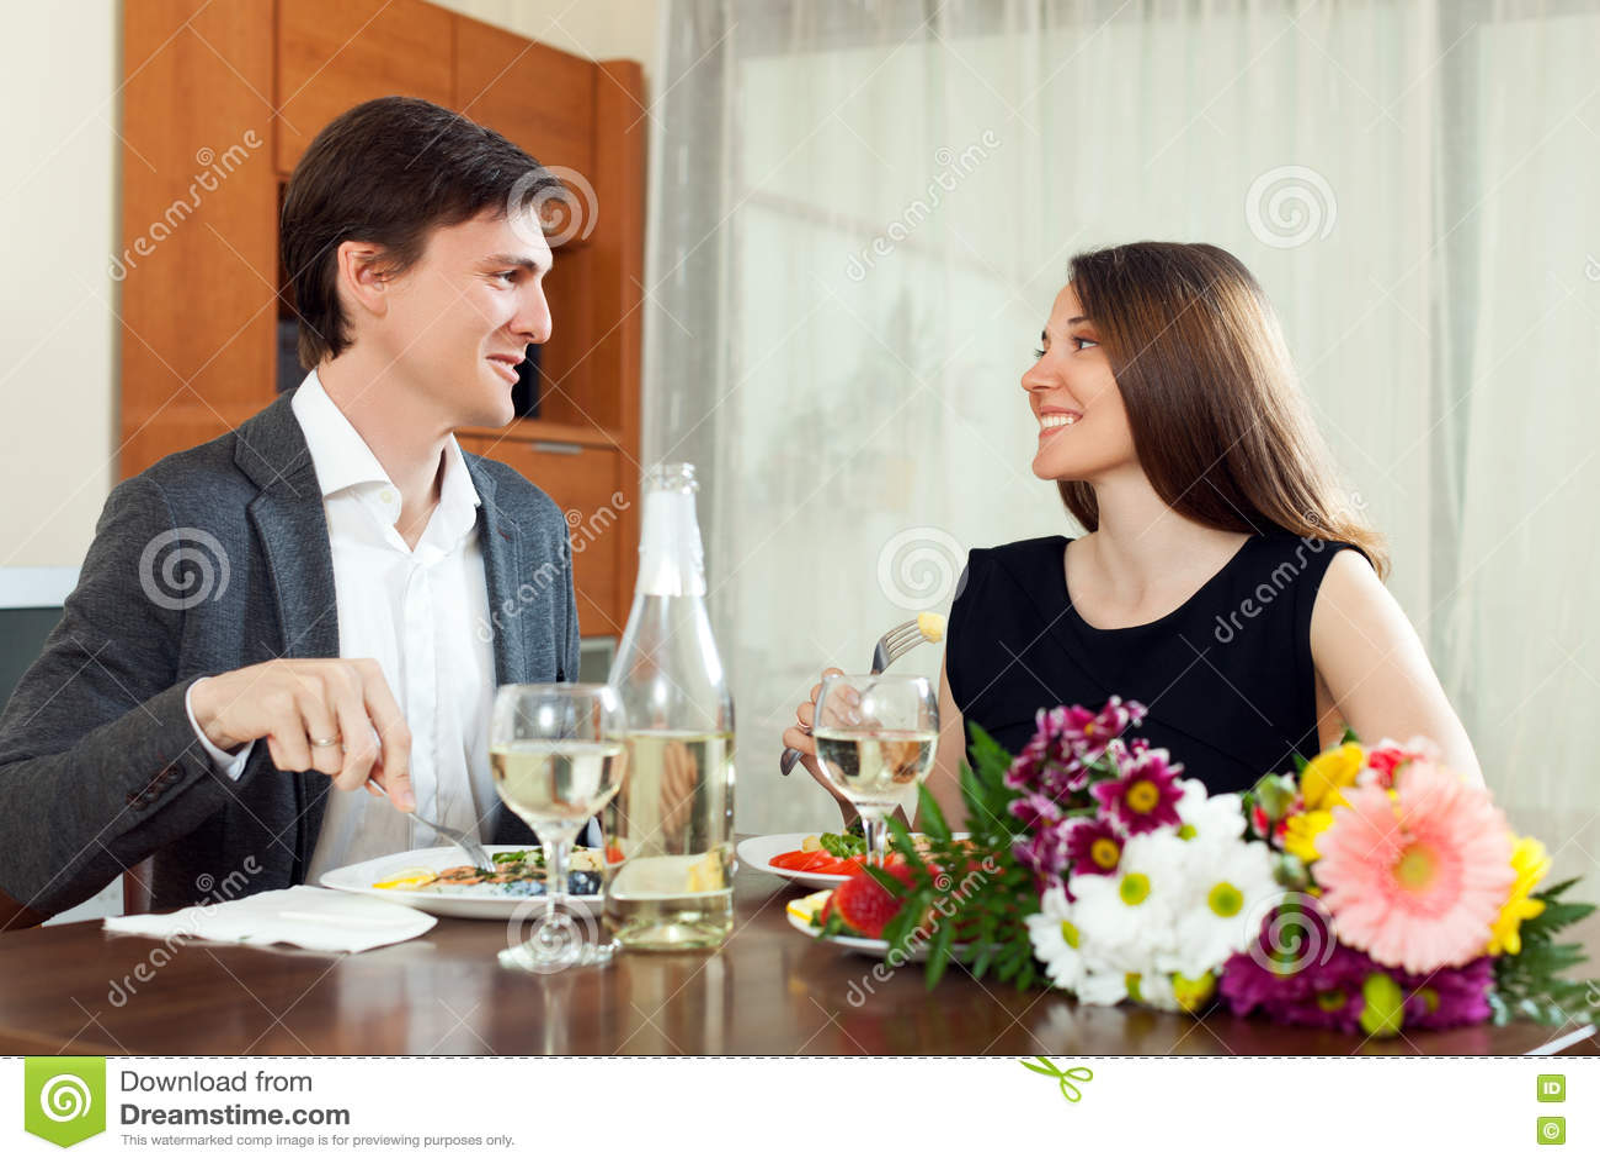 Happy family having romantic dinner and celebration